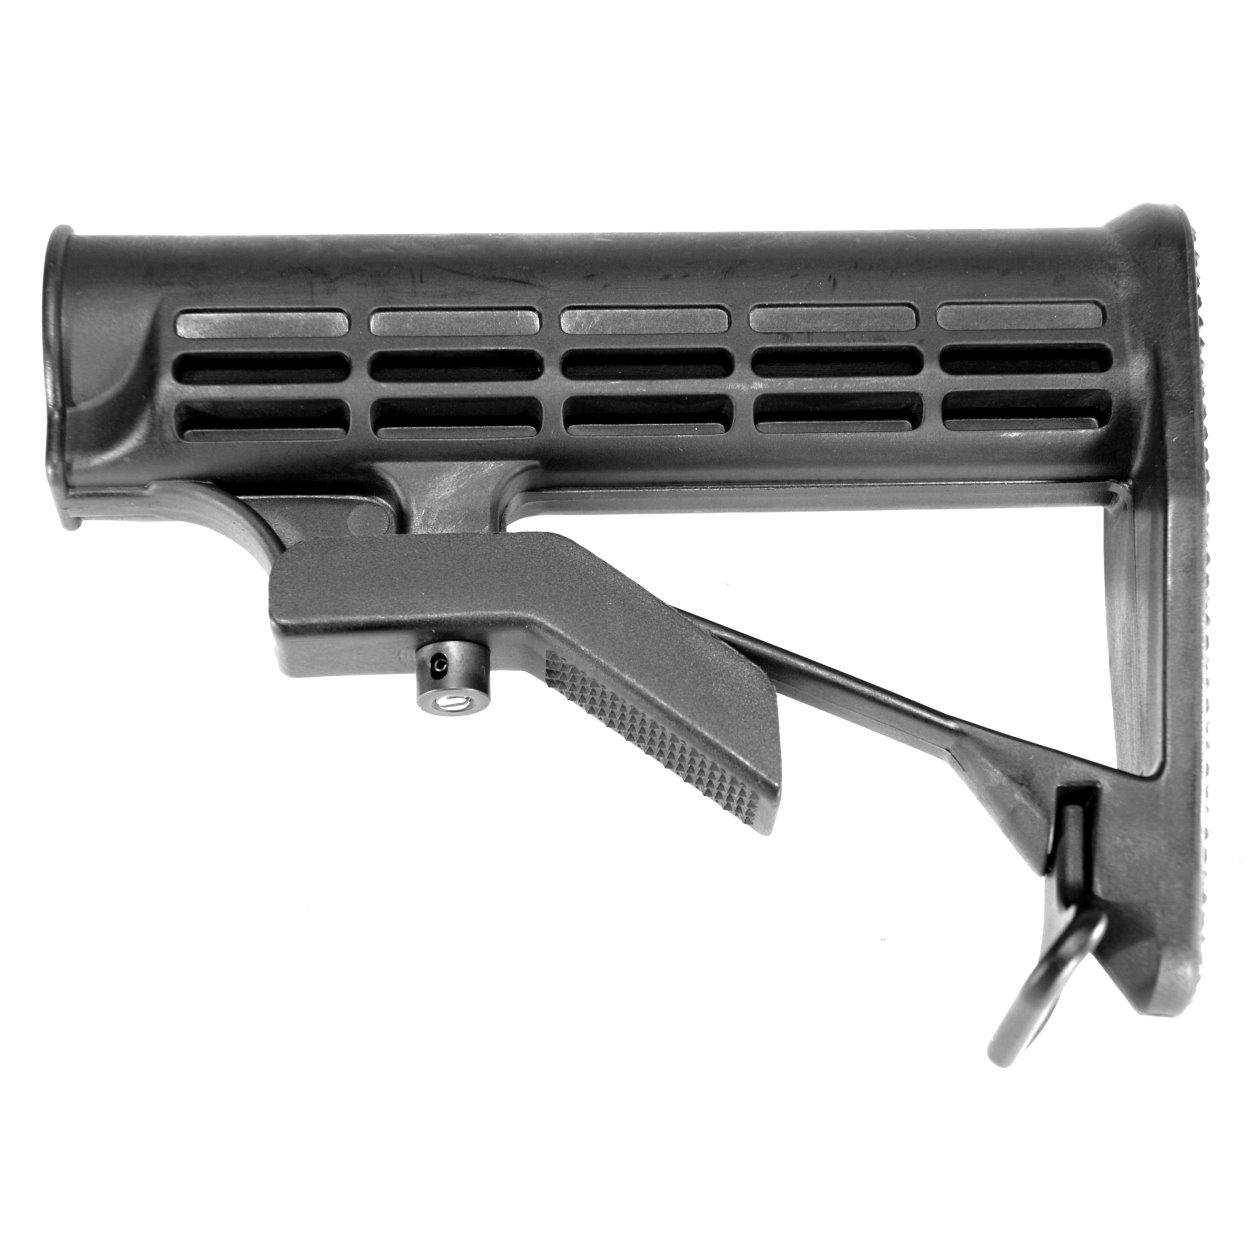 Ds Arms Dsa Ar15 Lightweight Enhanced Stock Ti Stock Metal